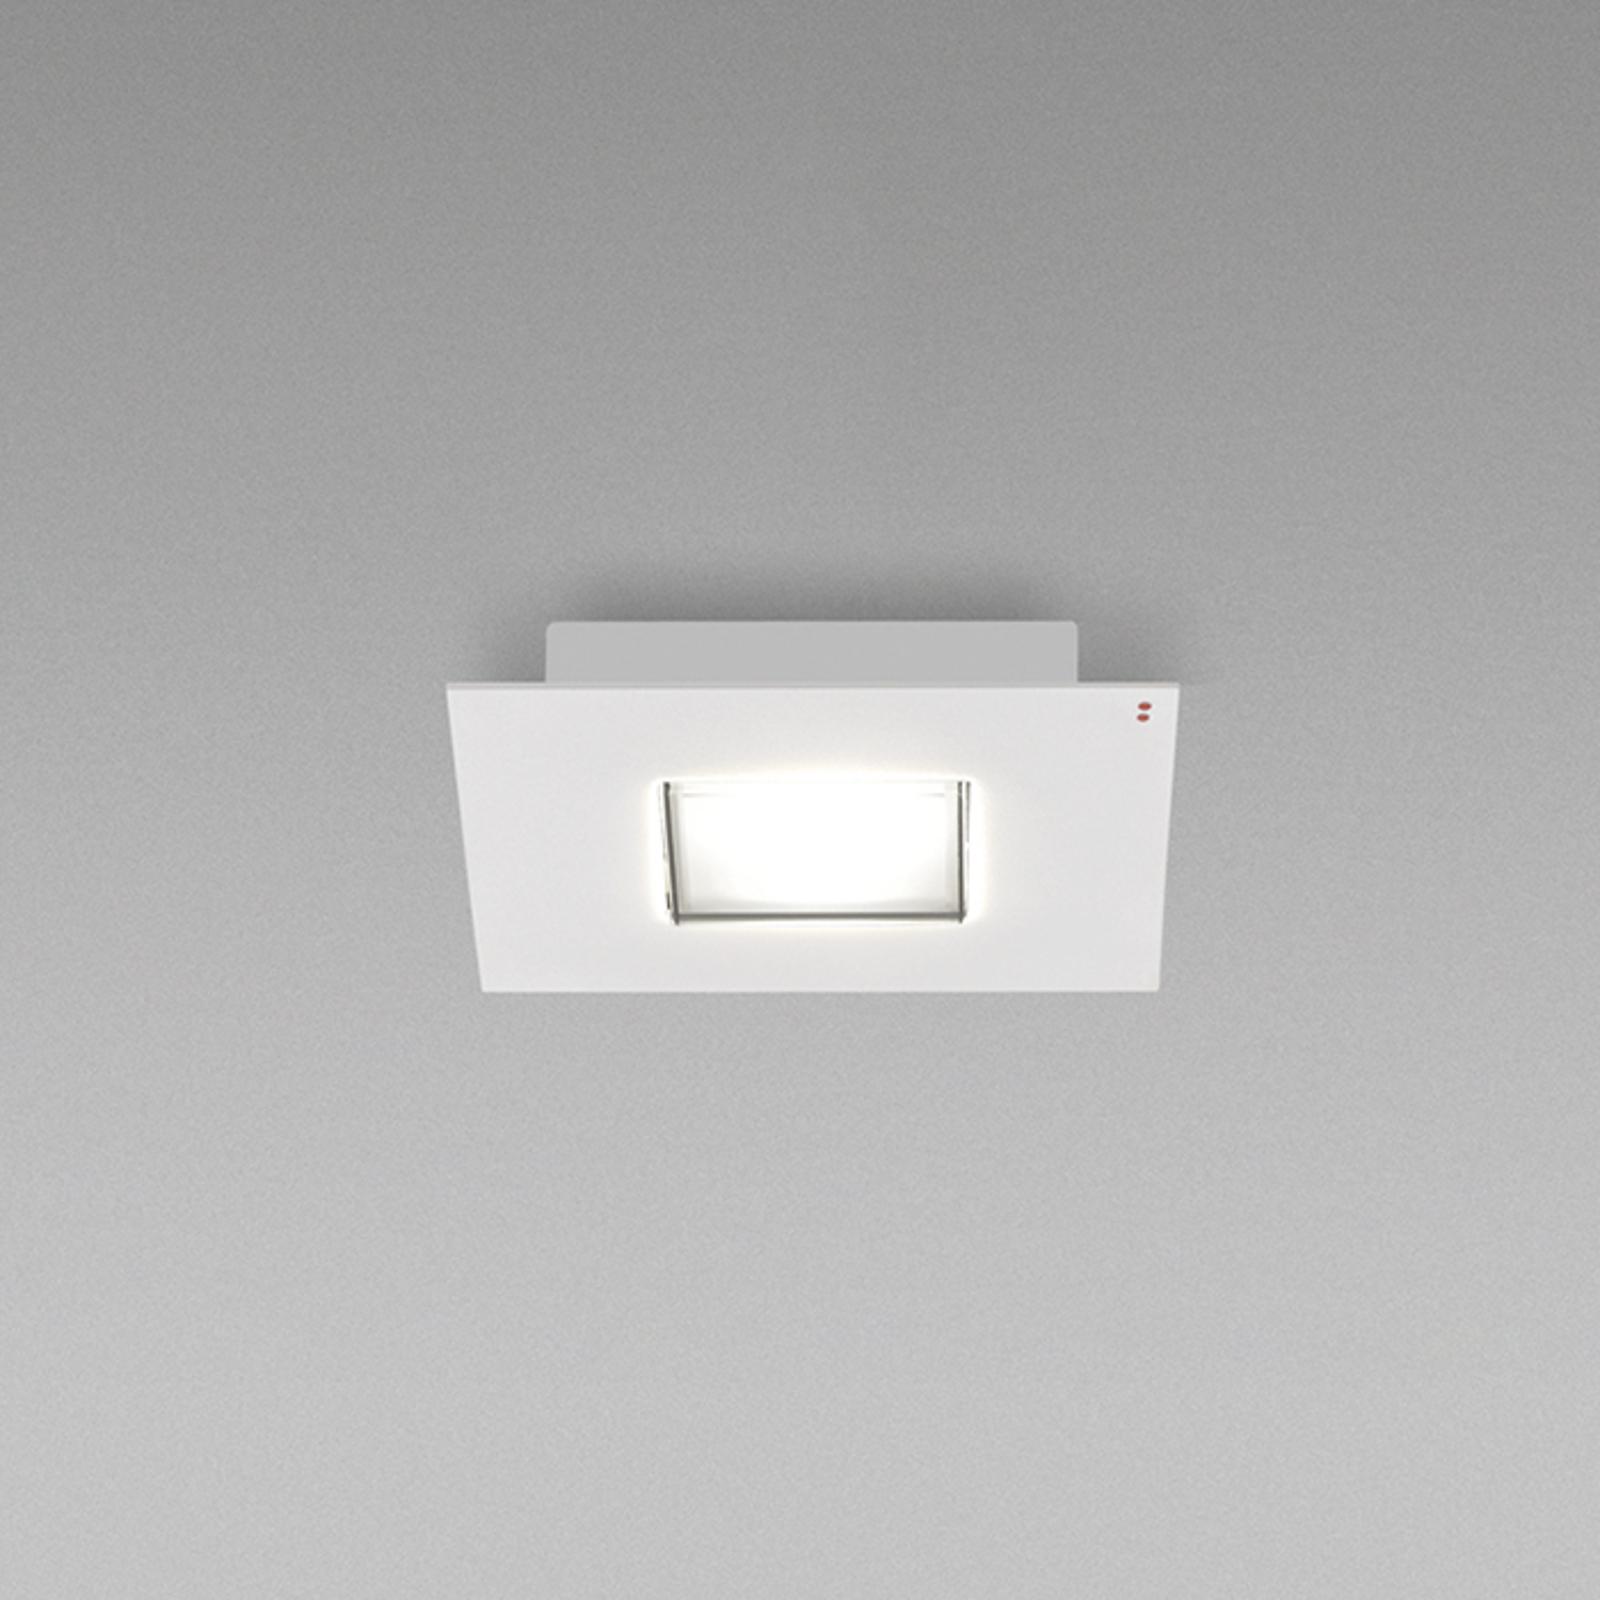 Square Quarter LED ceiling light_3503234_1